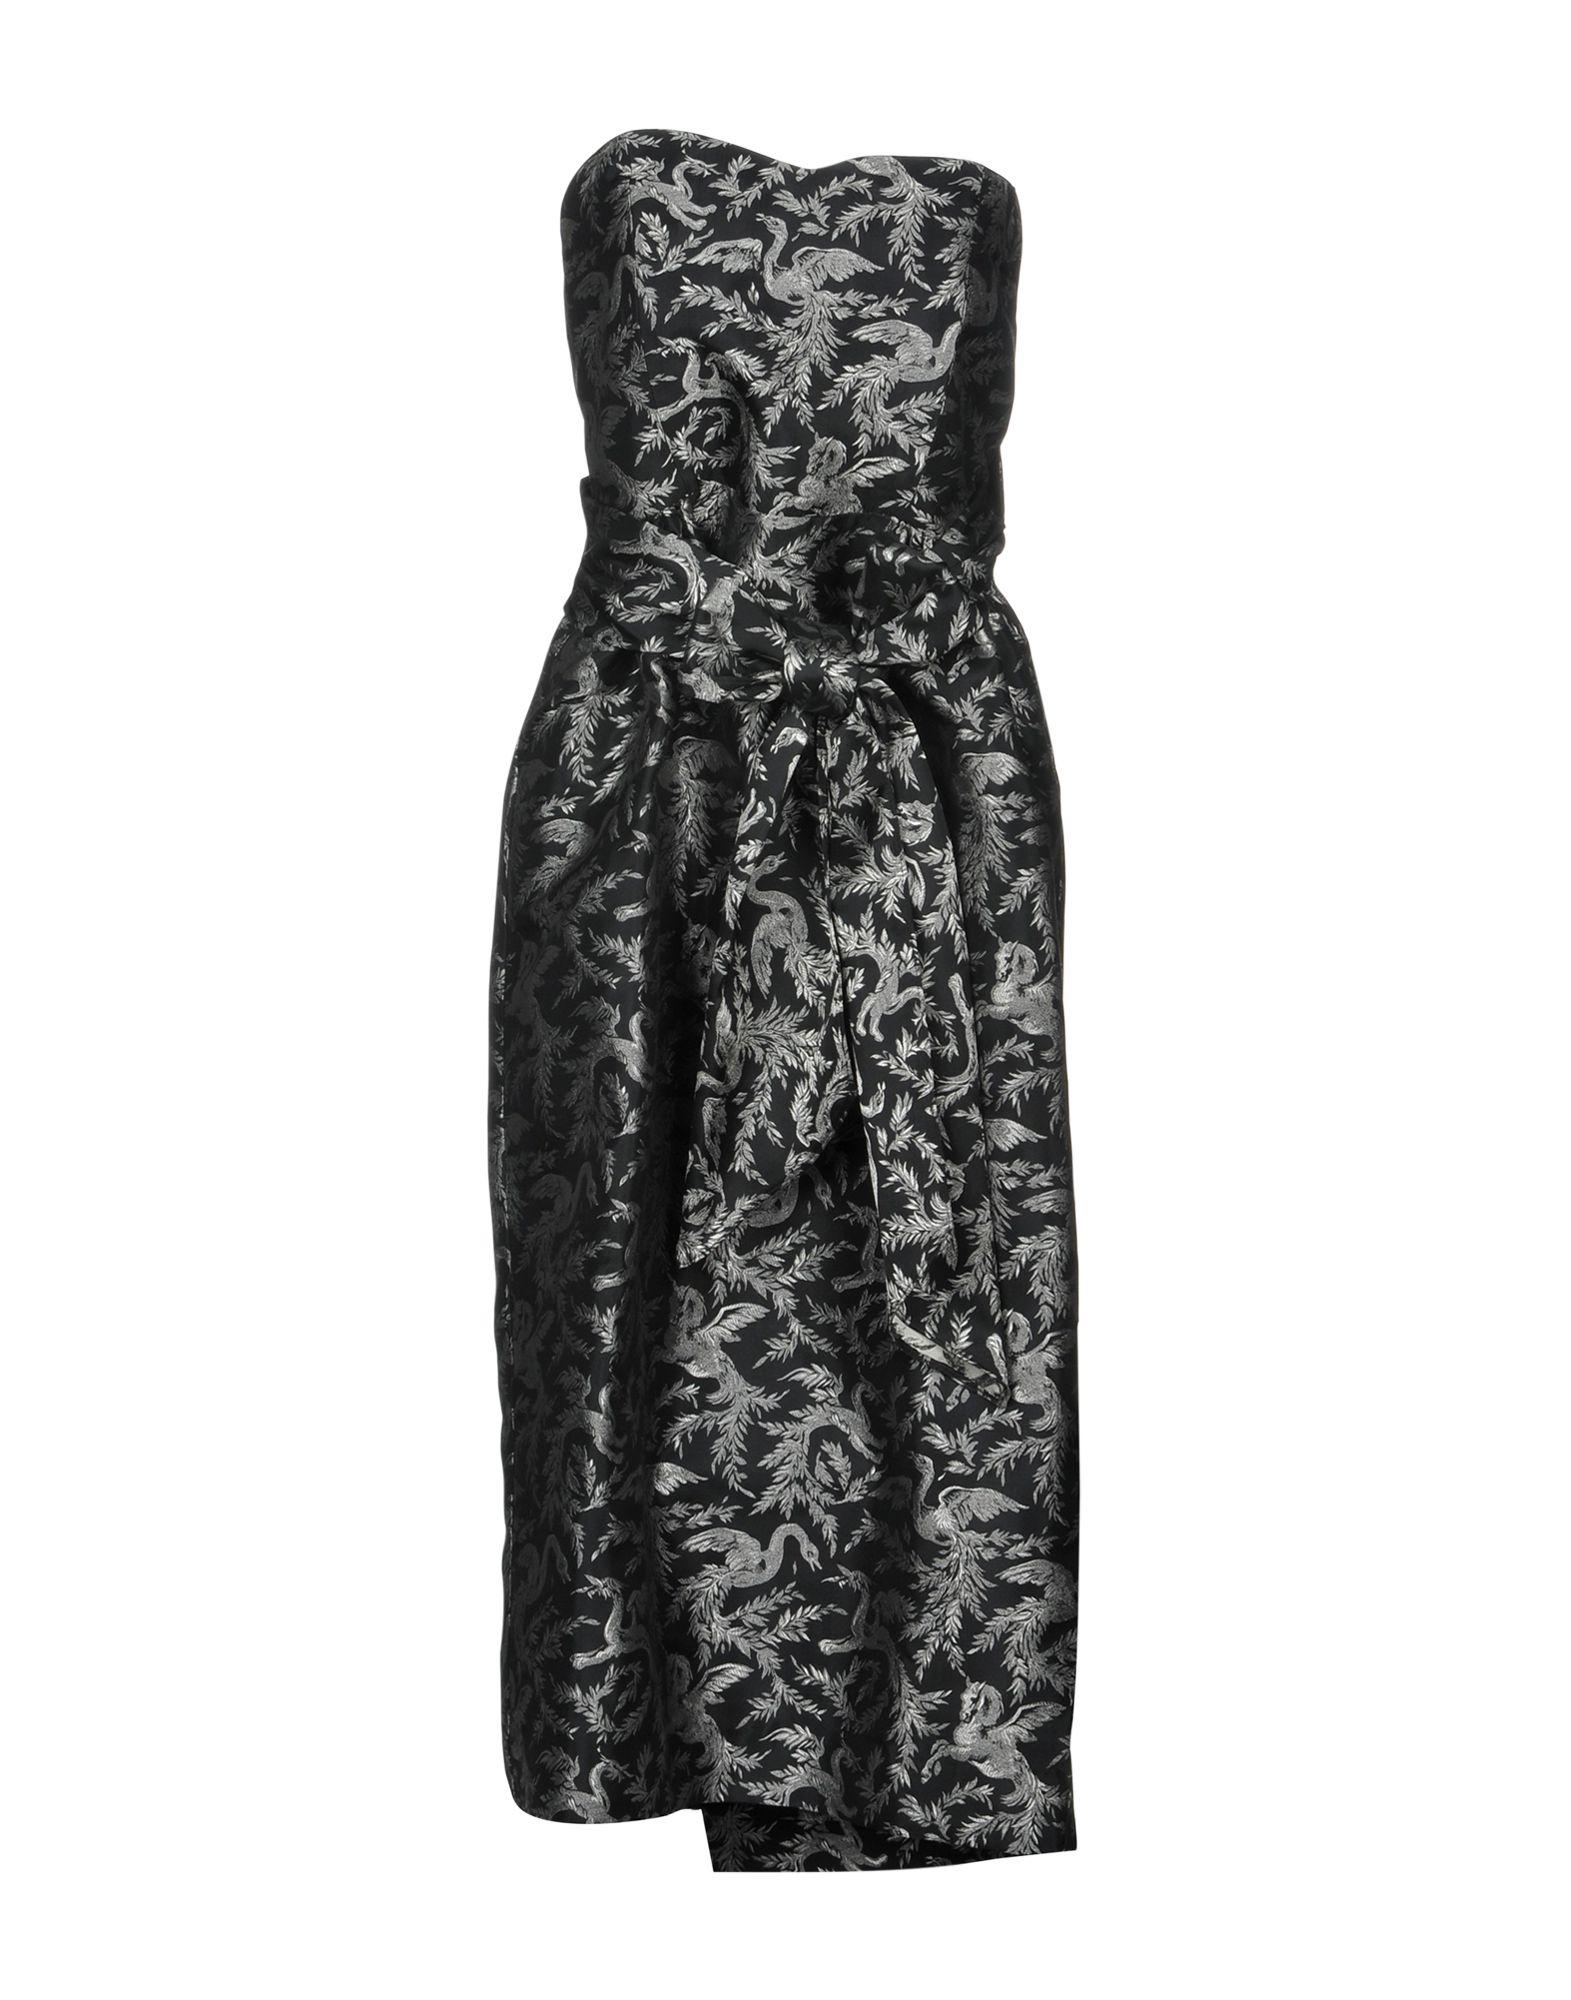 ESSENTIEL ANTWERP Платье длиной 3/4 nardi pvl 4 lt 33 x